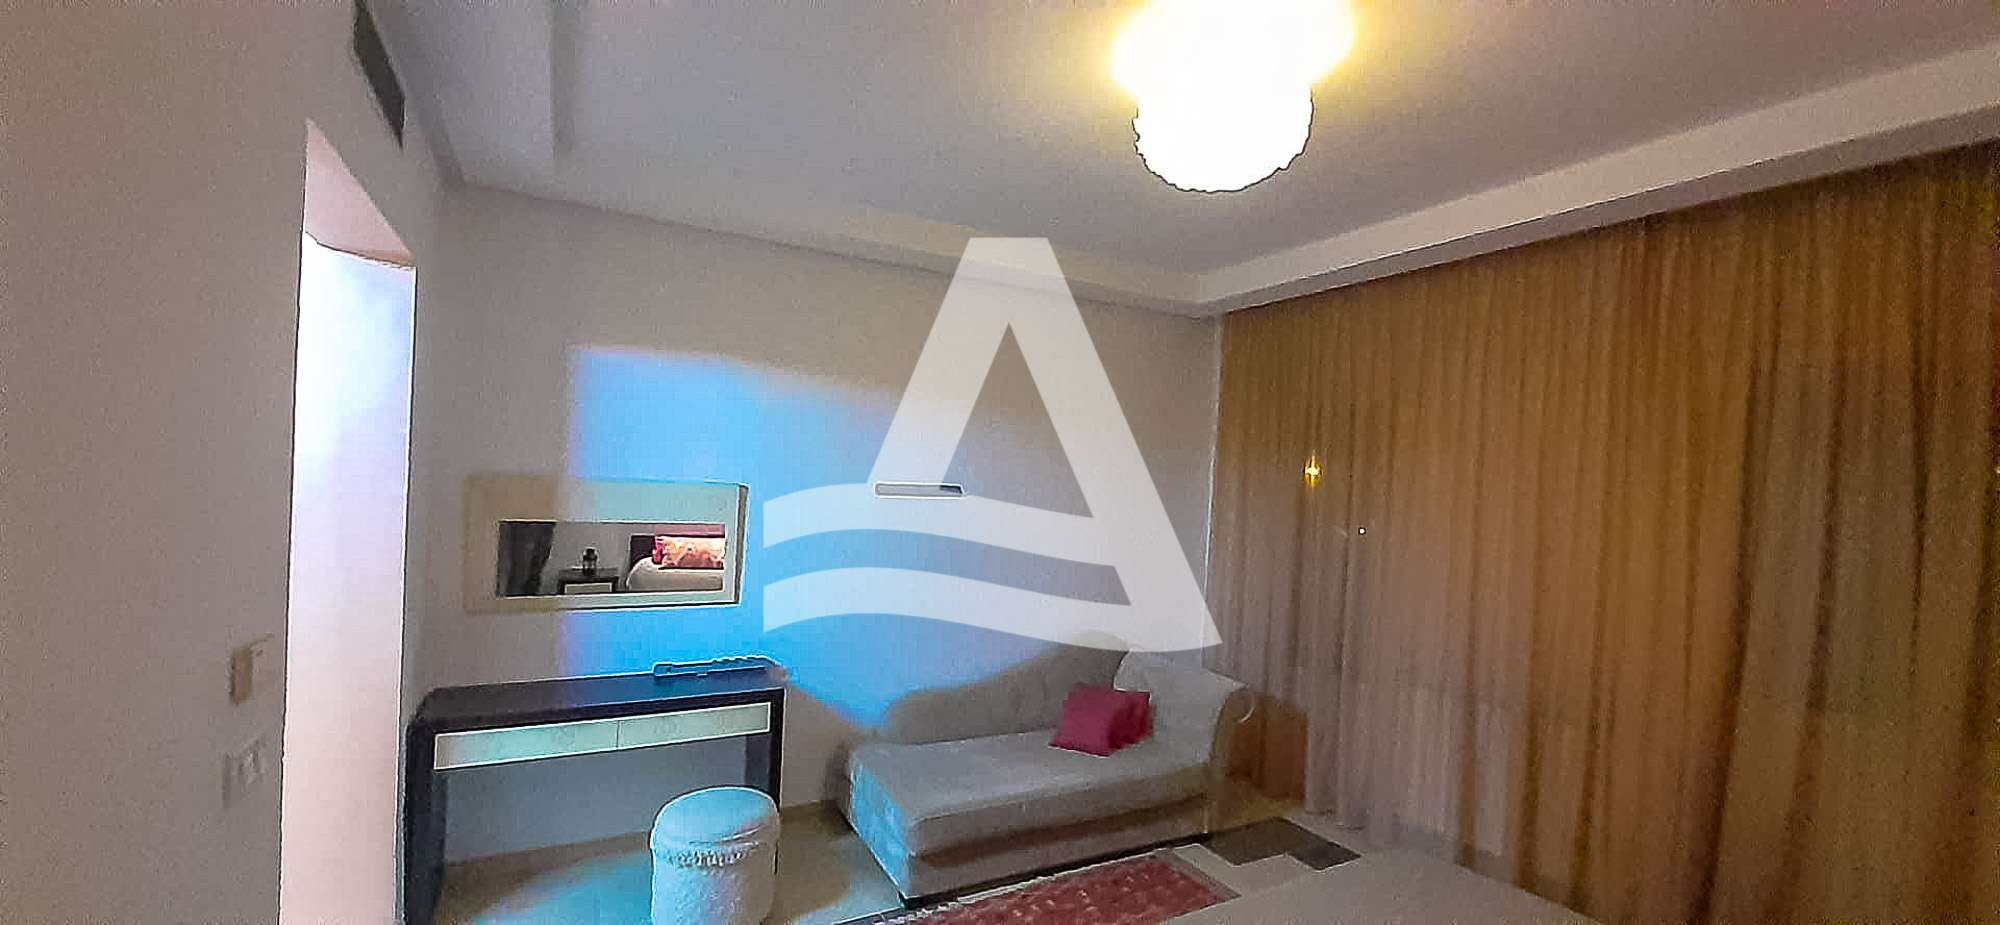 httpss3.amazonaws.comlogimoaws_Arcane_immobilière_la_Marsa-_location_-_vente_la_marsa_6_sur_12_1574867274153